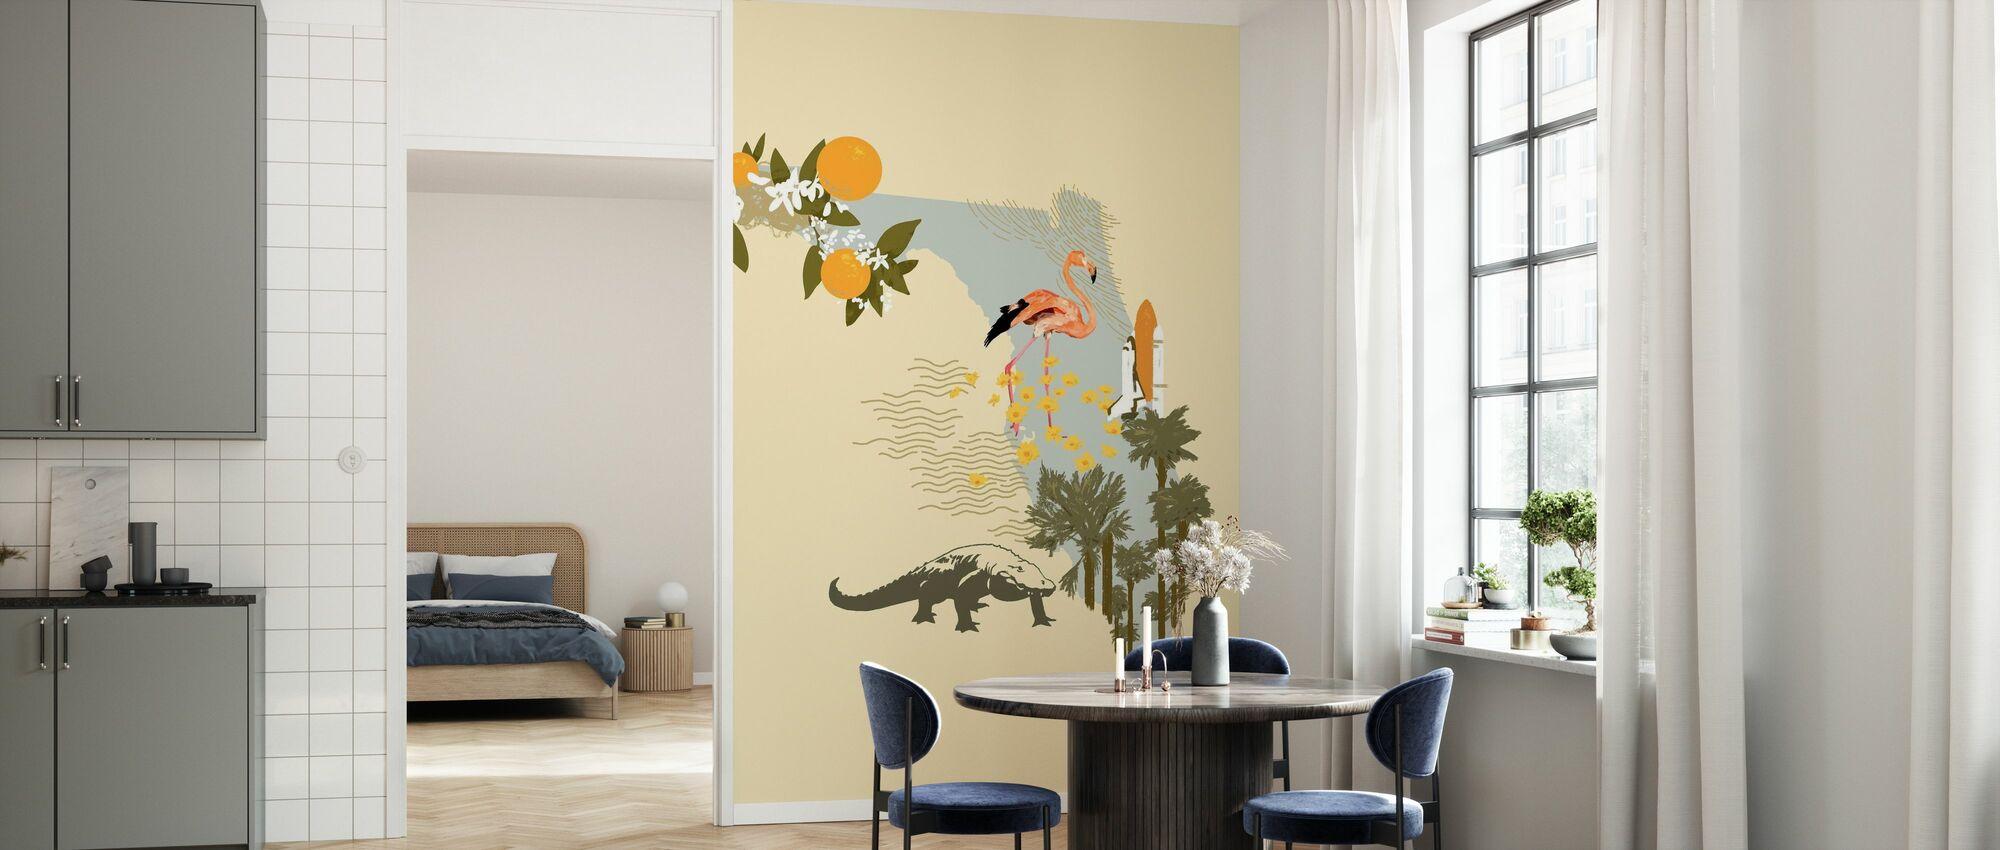 Illustrated Florida - Wallpaper - Kitchen